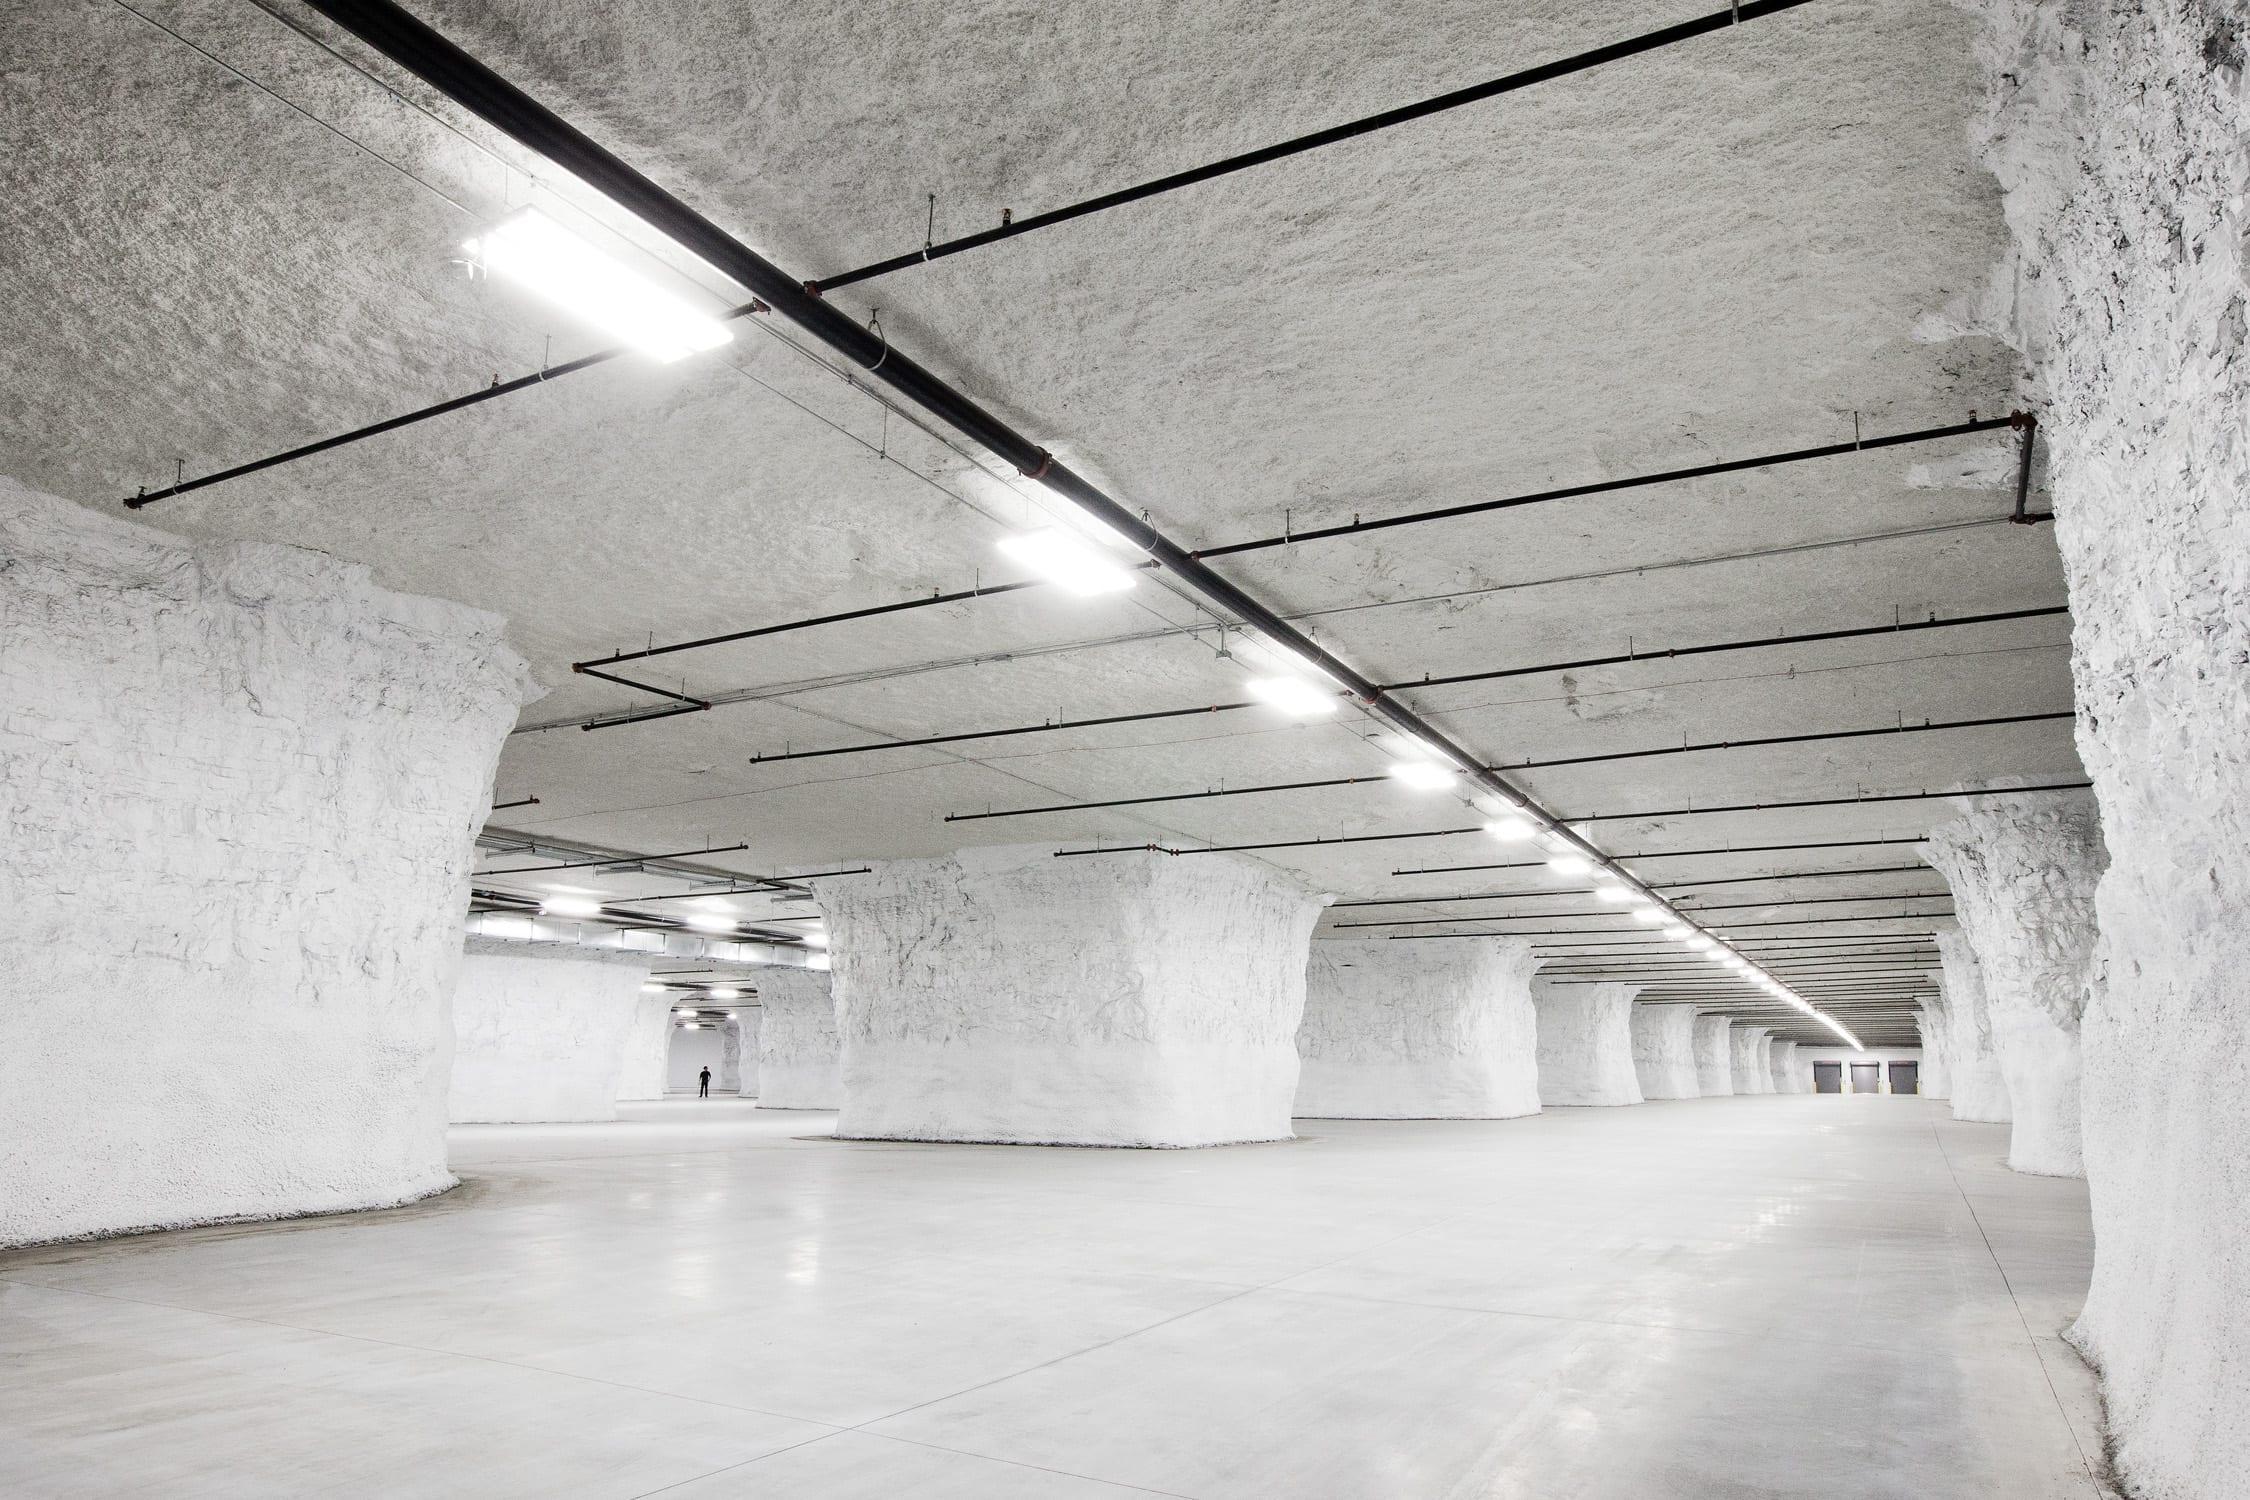 Industrial Development - SubTropolis - The world's largest underground business complex.